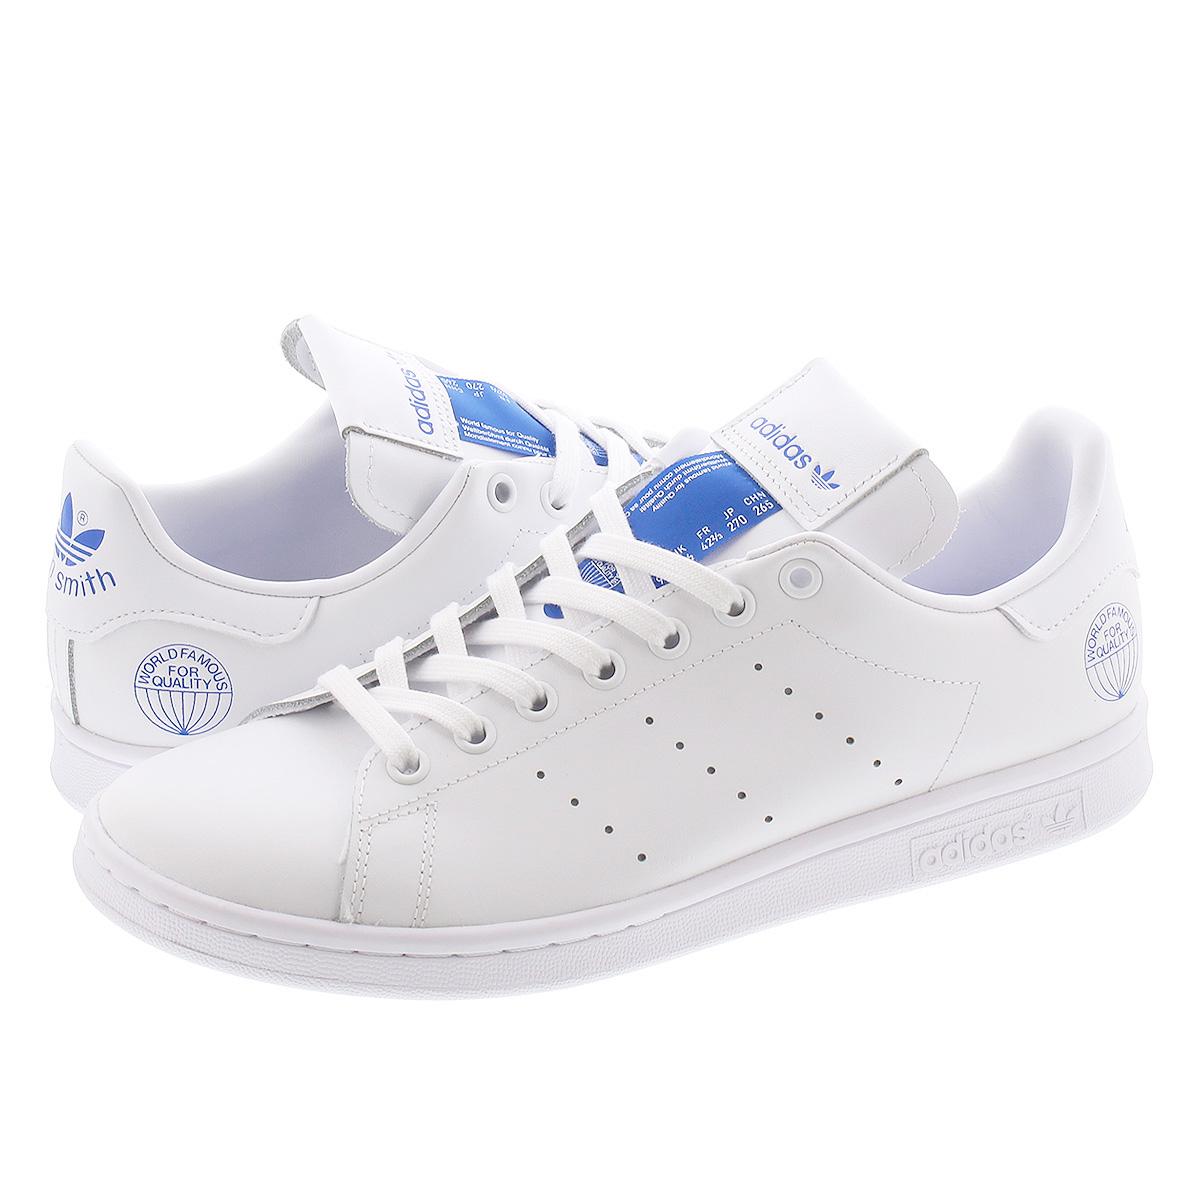 adidas STAN SMITH アディダス スタンスミス FTWR WHITE/FTWR WHITE/BLUE BIRD fv4083